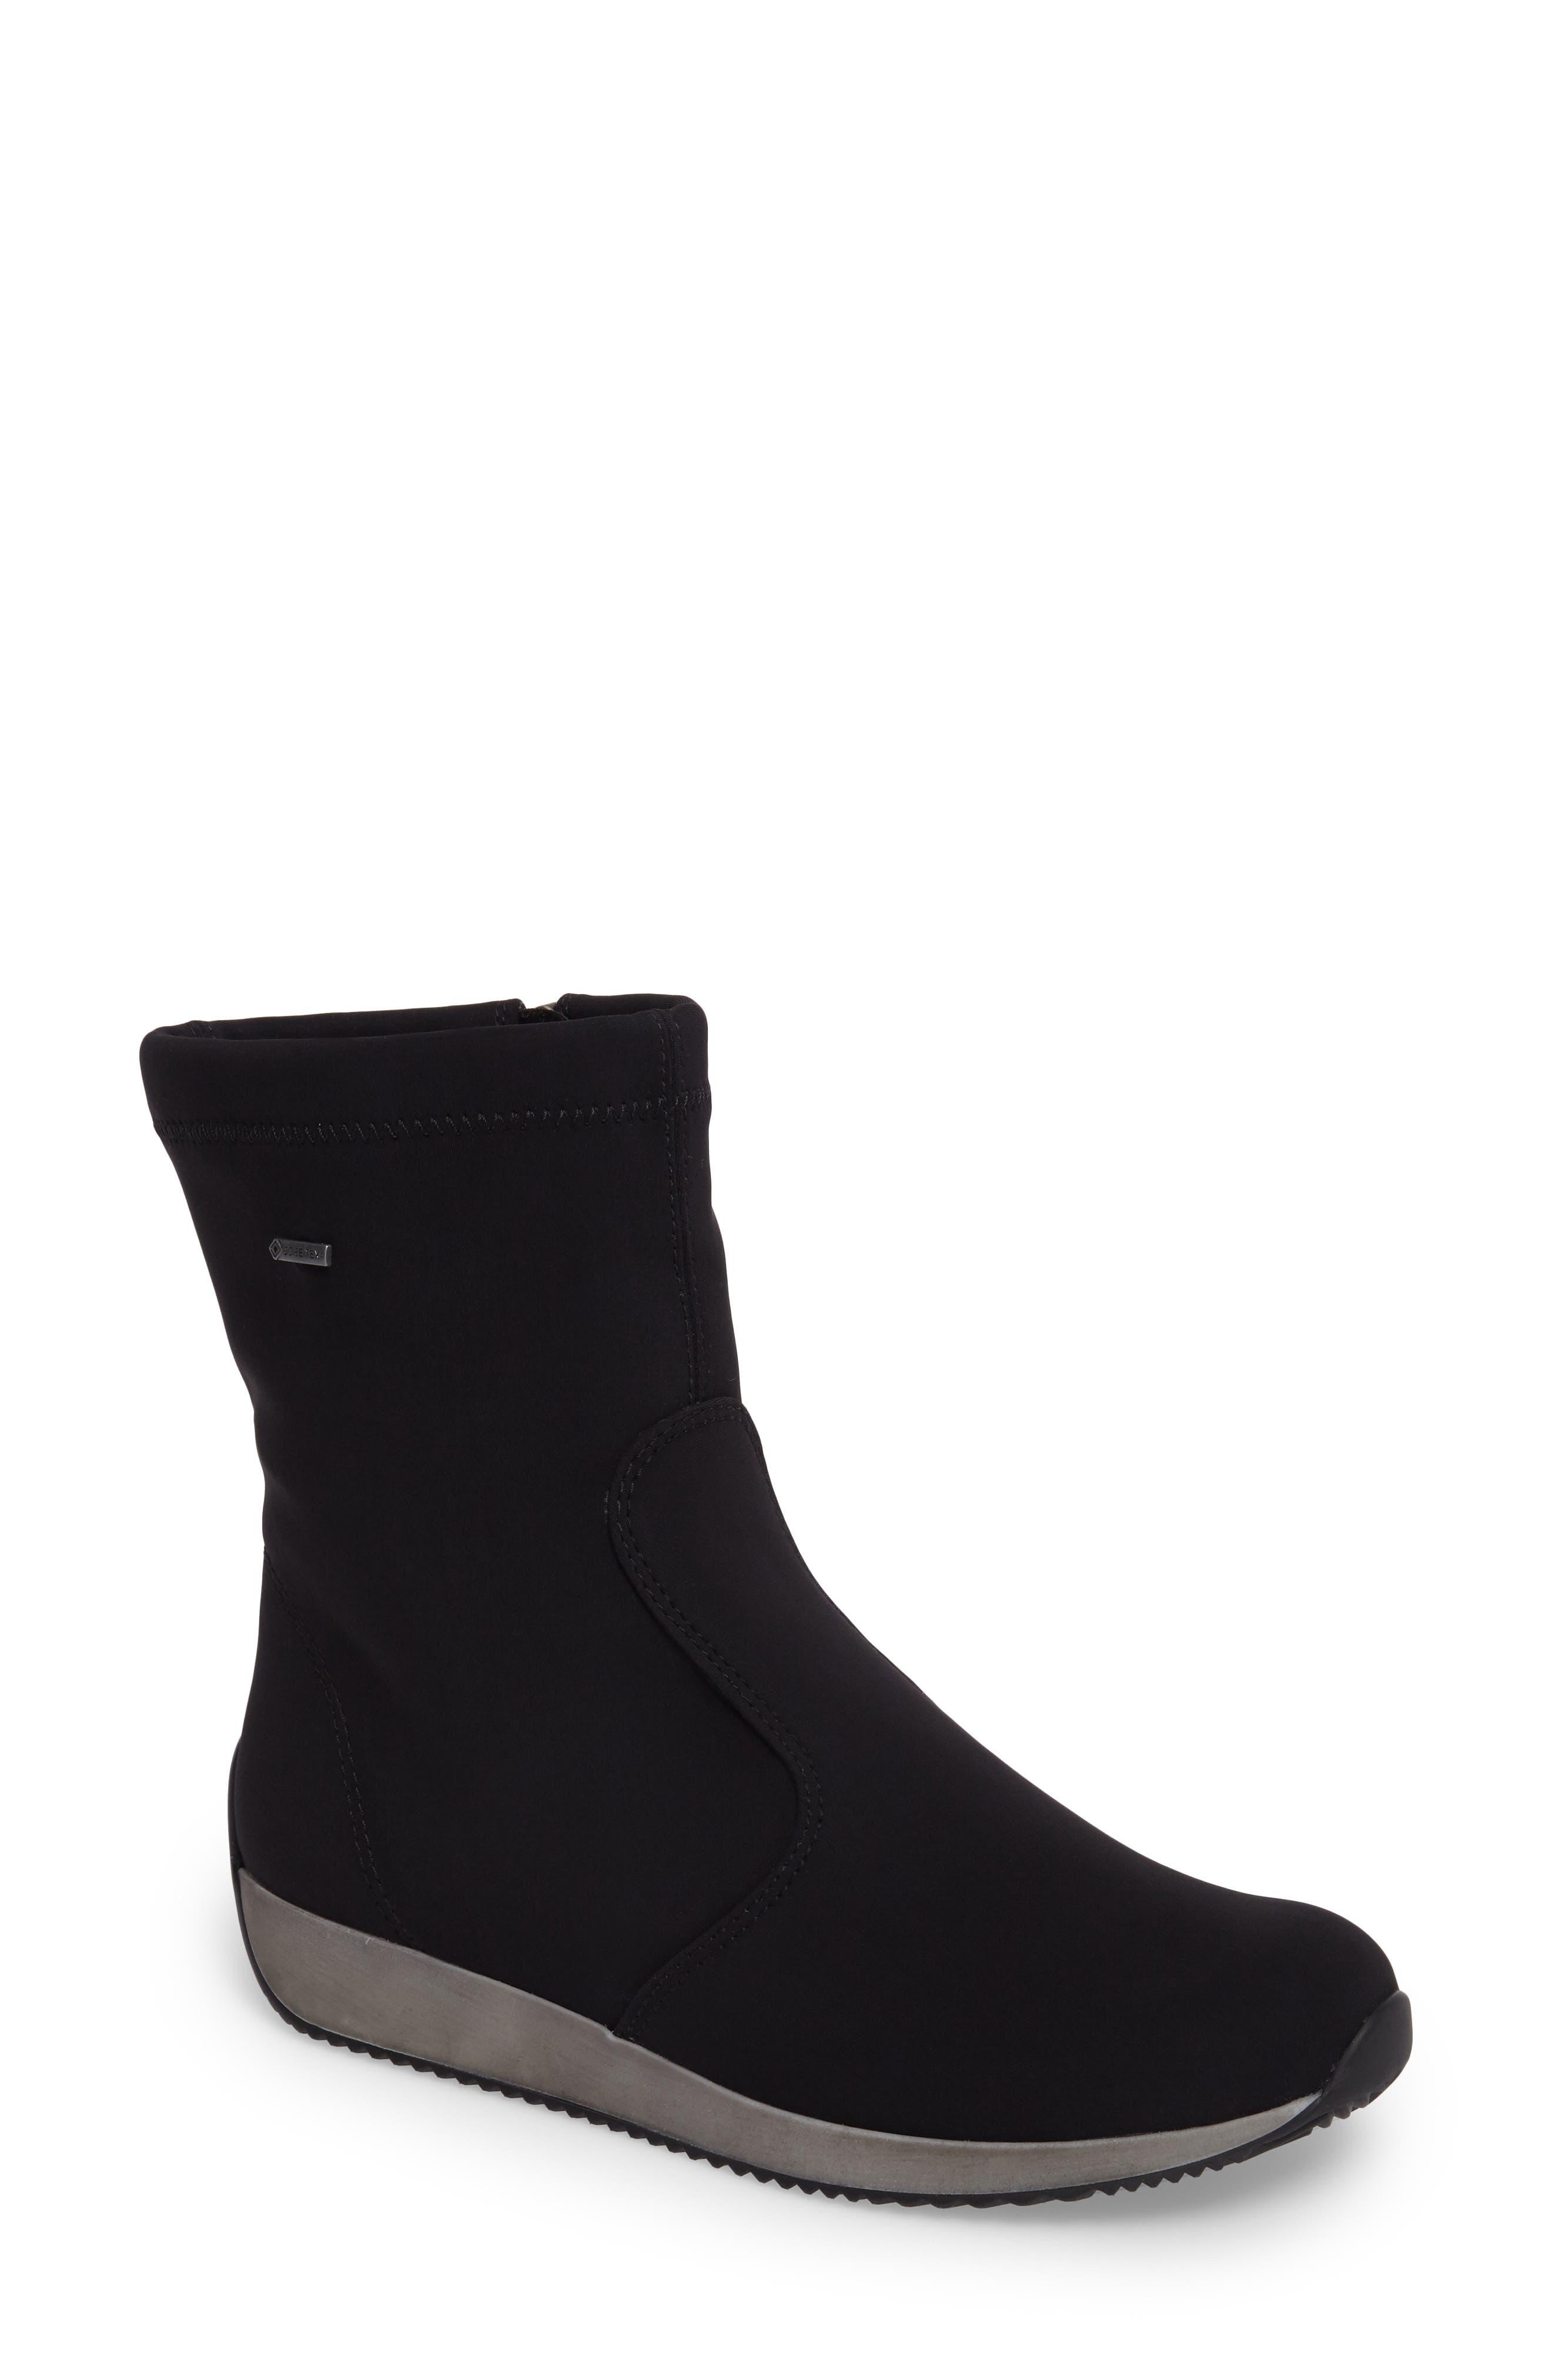 Luella Waterproof Gore-Tex<sup>®</sup> Boot,                         Main,                         color, Black Textile